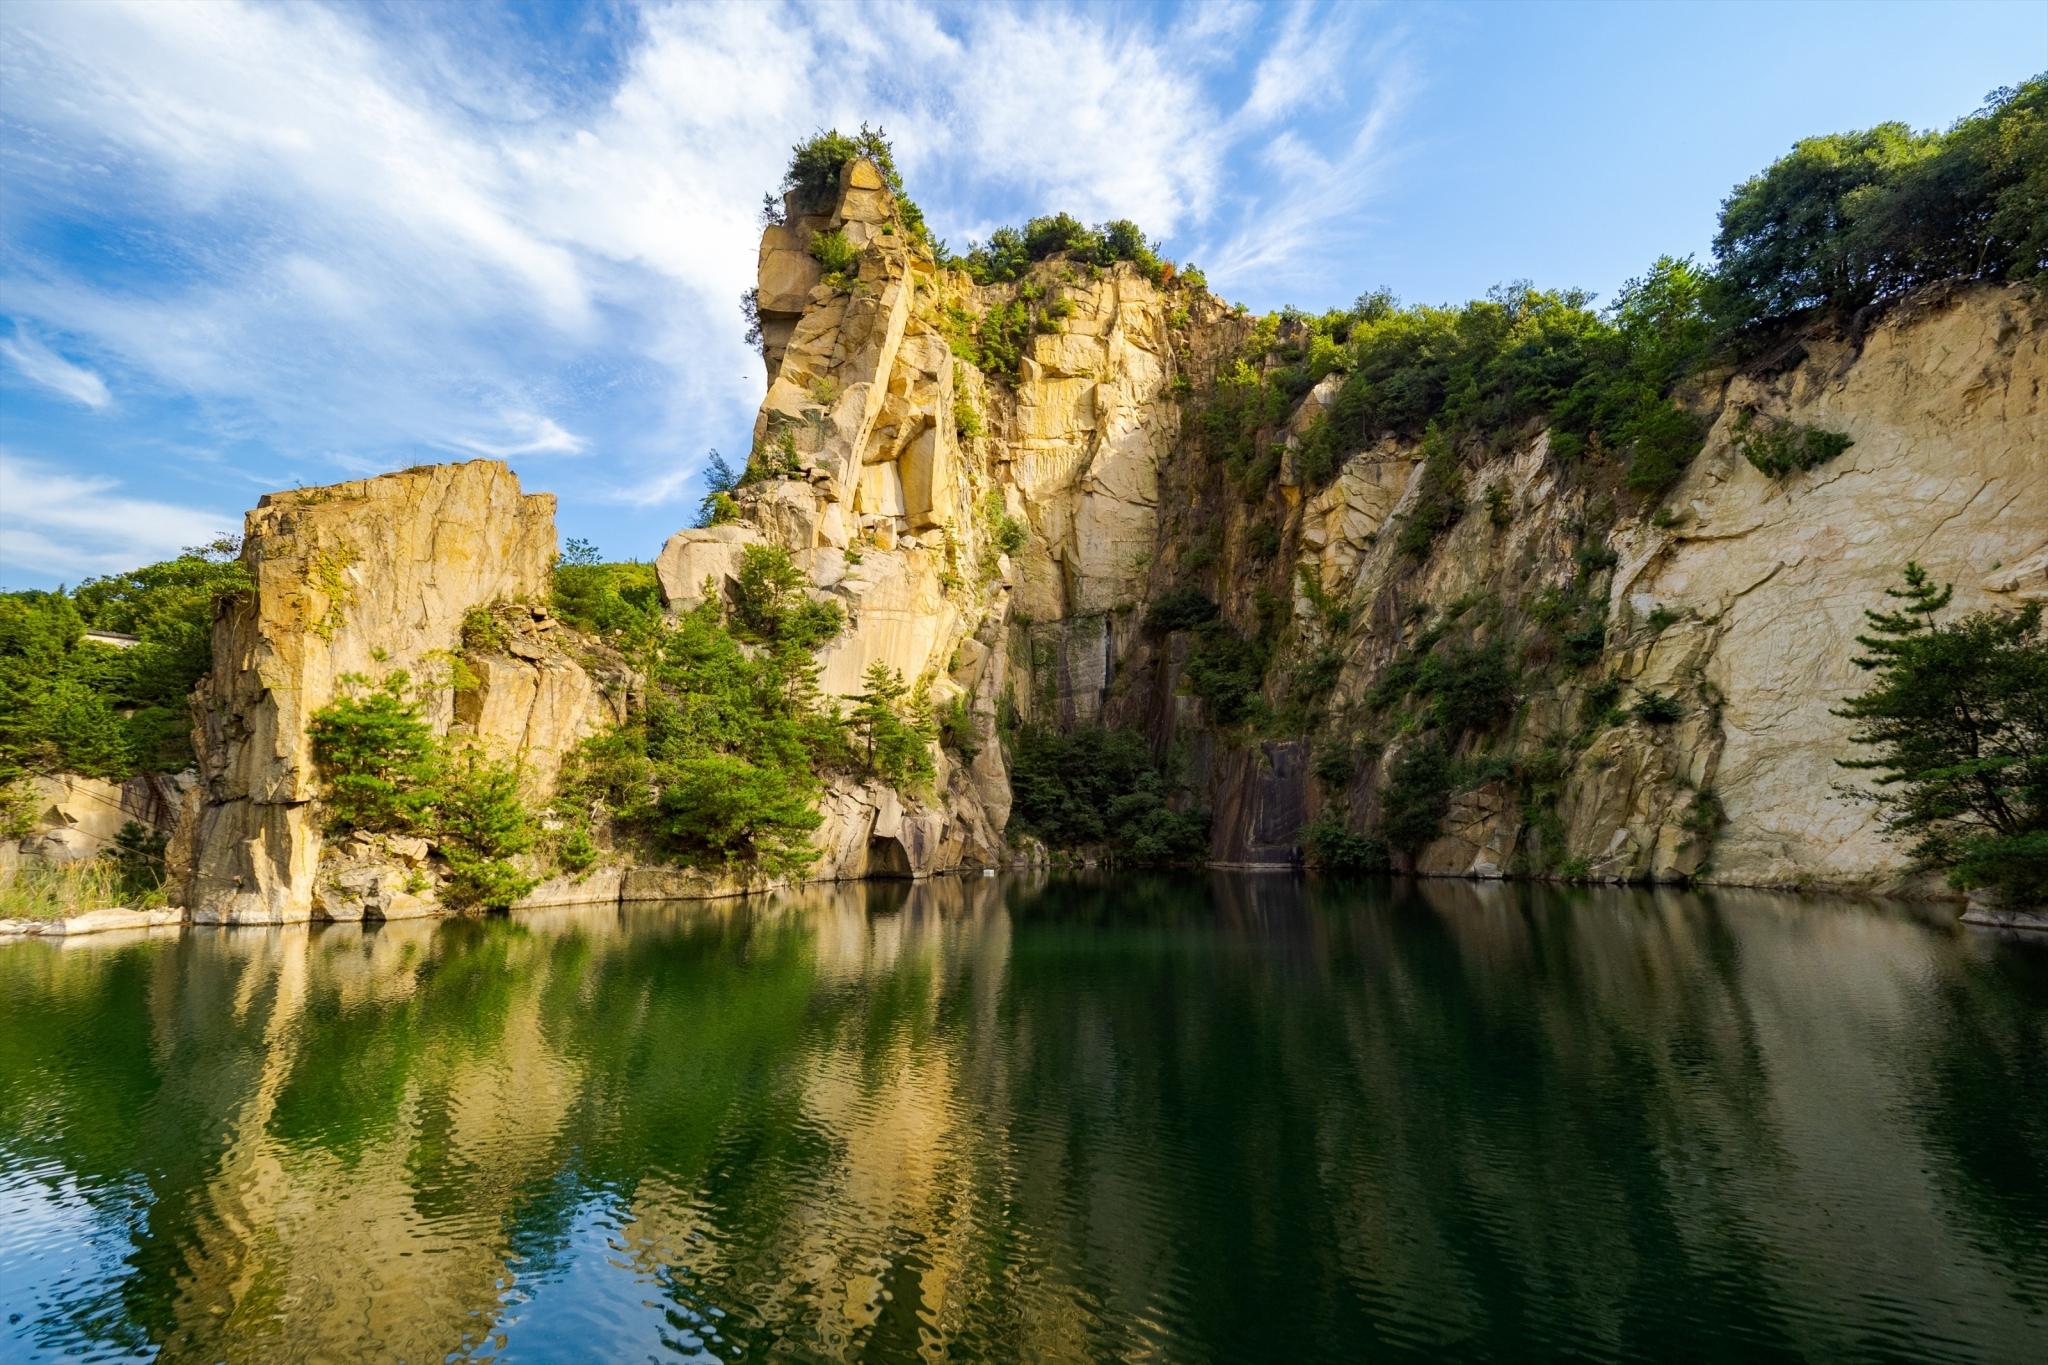 L'île de pierre: Kitagishima